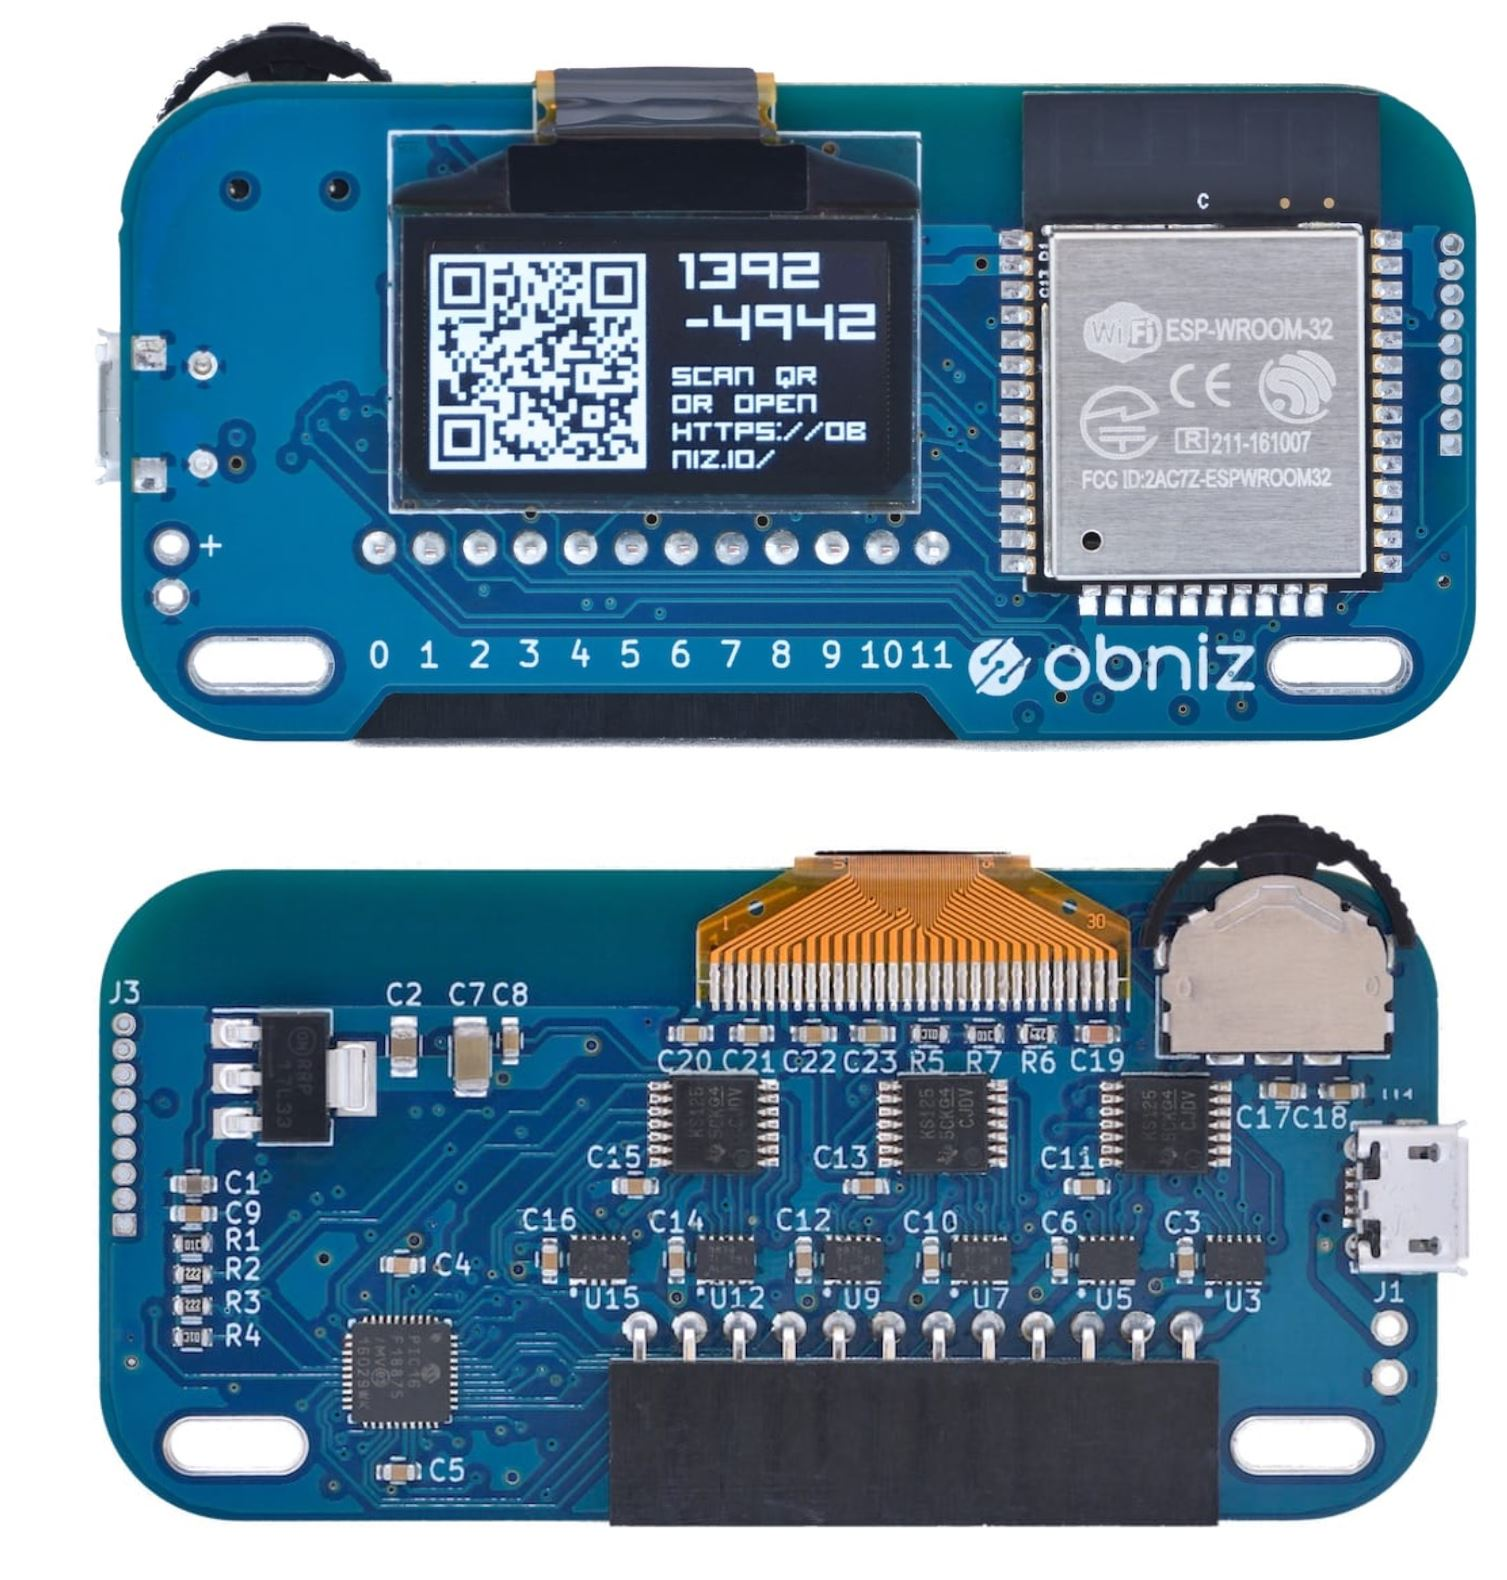 obniz is a hardware platform specially built for IoT